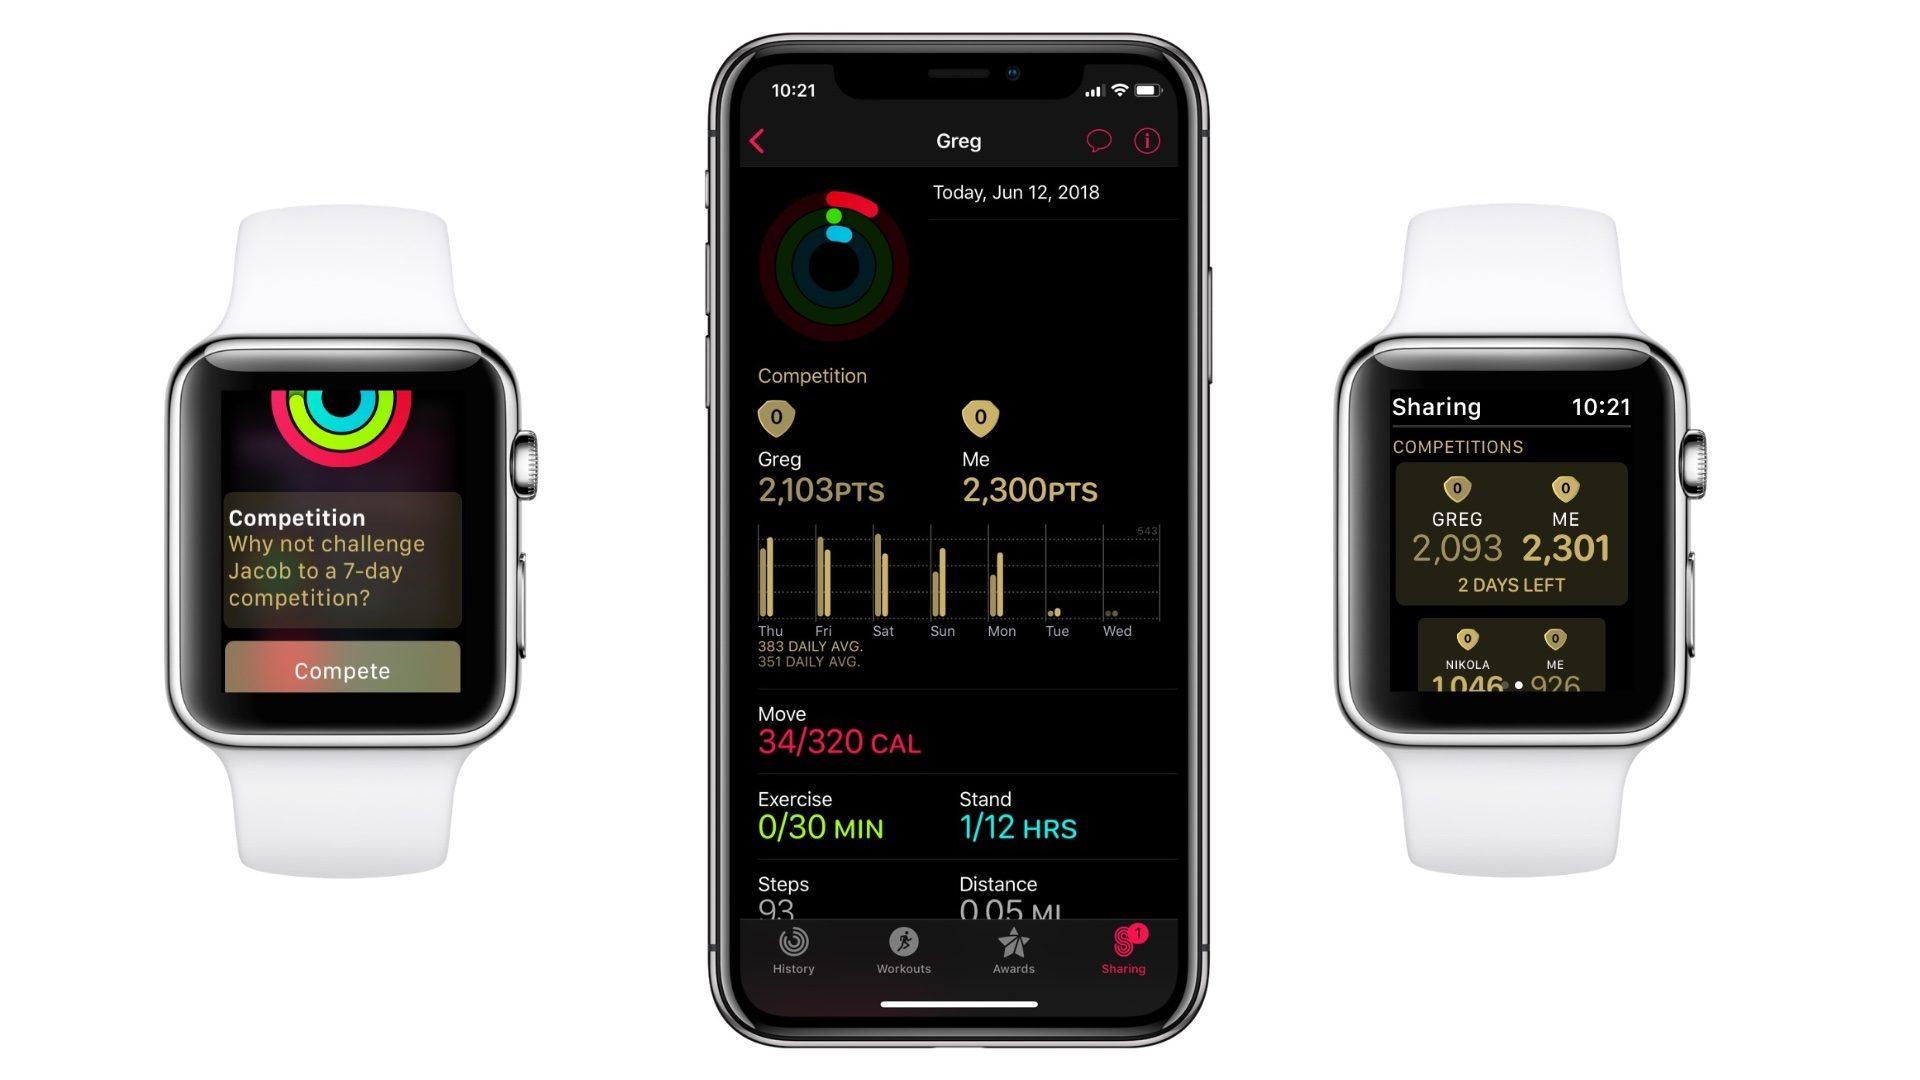 apple-watch-watchos-5-competition.jpg